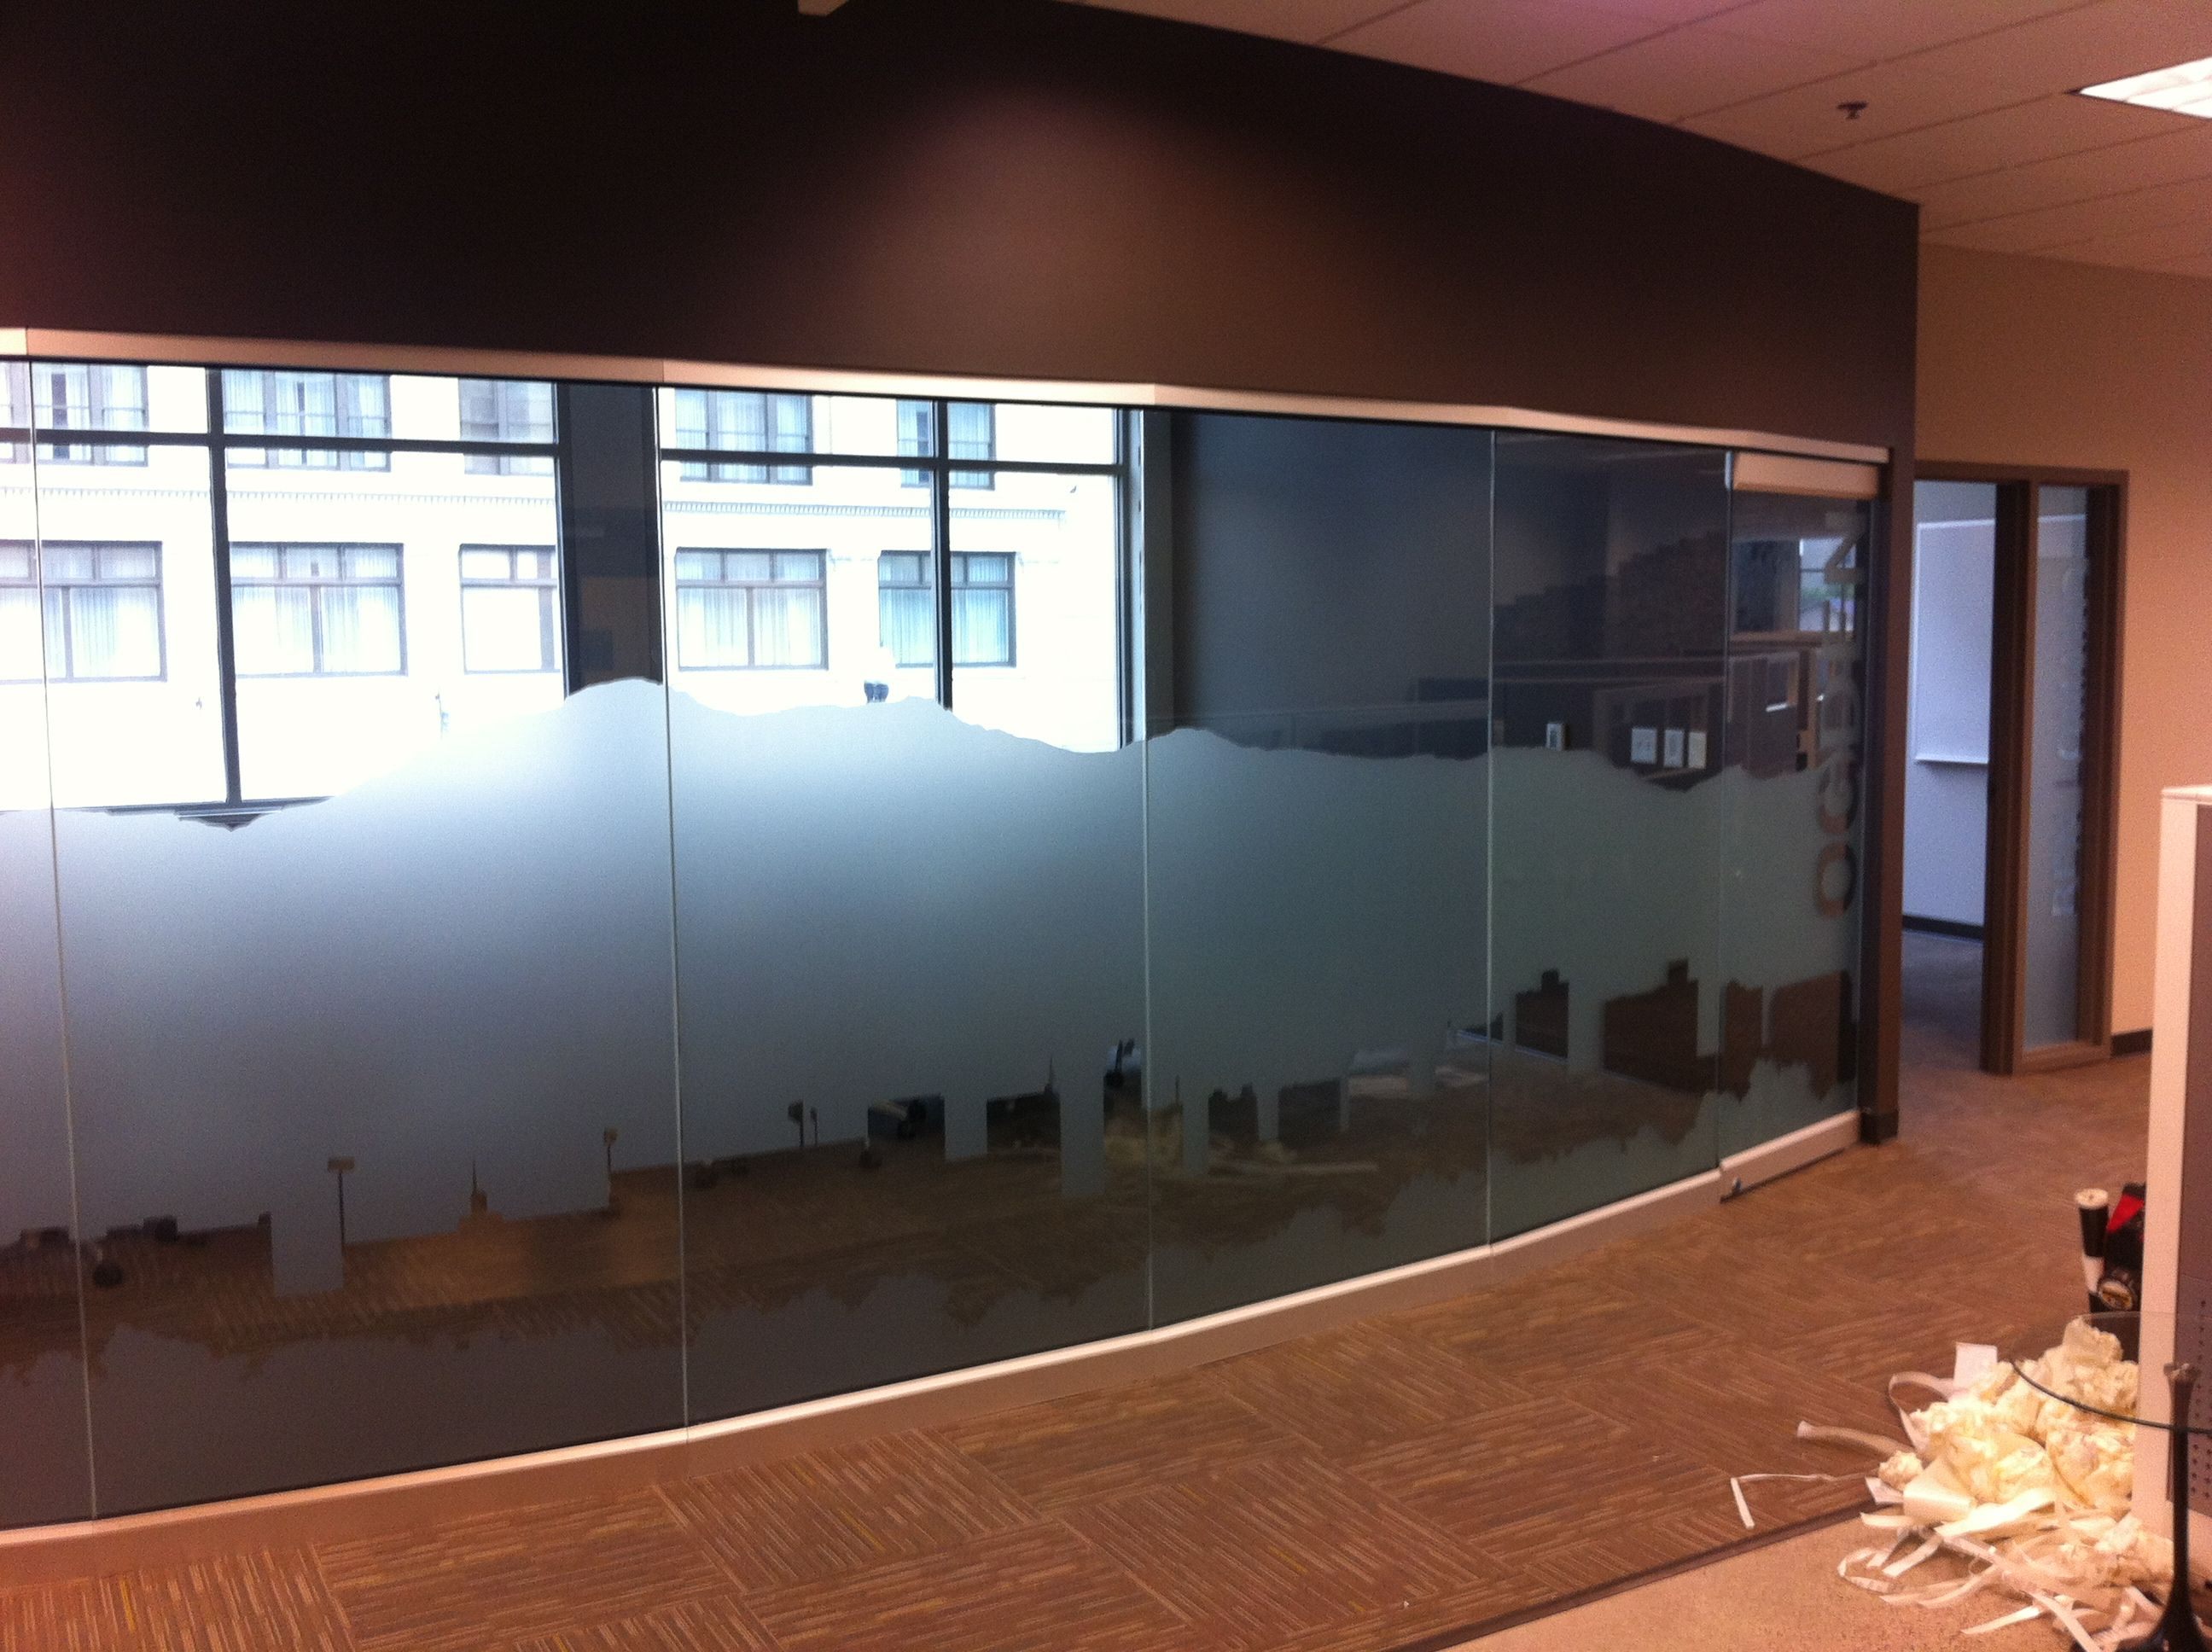 Conference Room Cityscape On Glass Interior Vinyl Decor